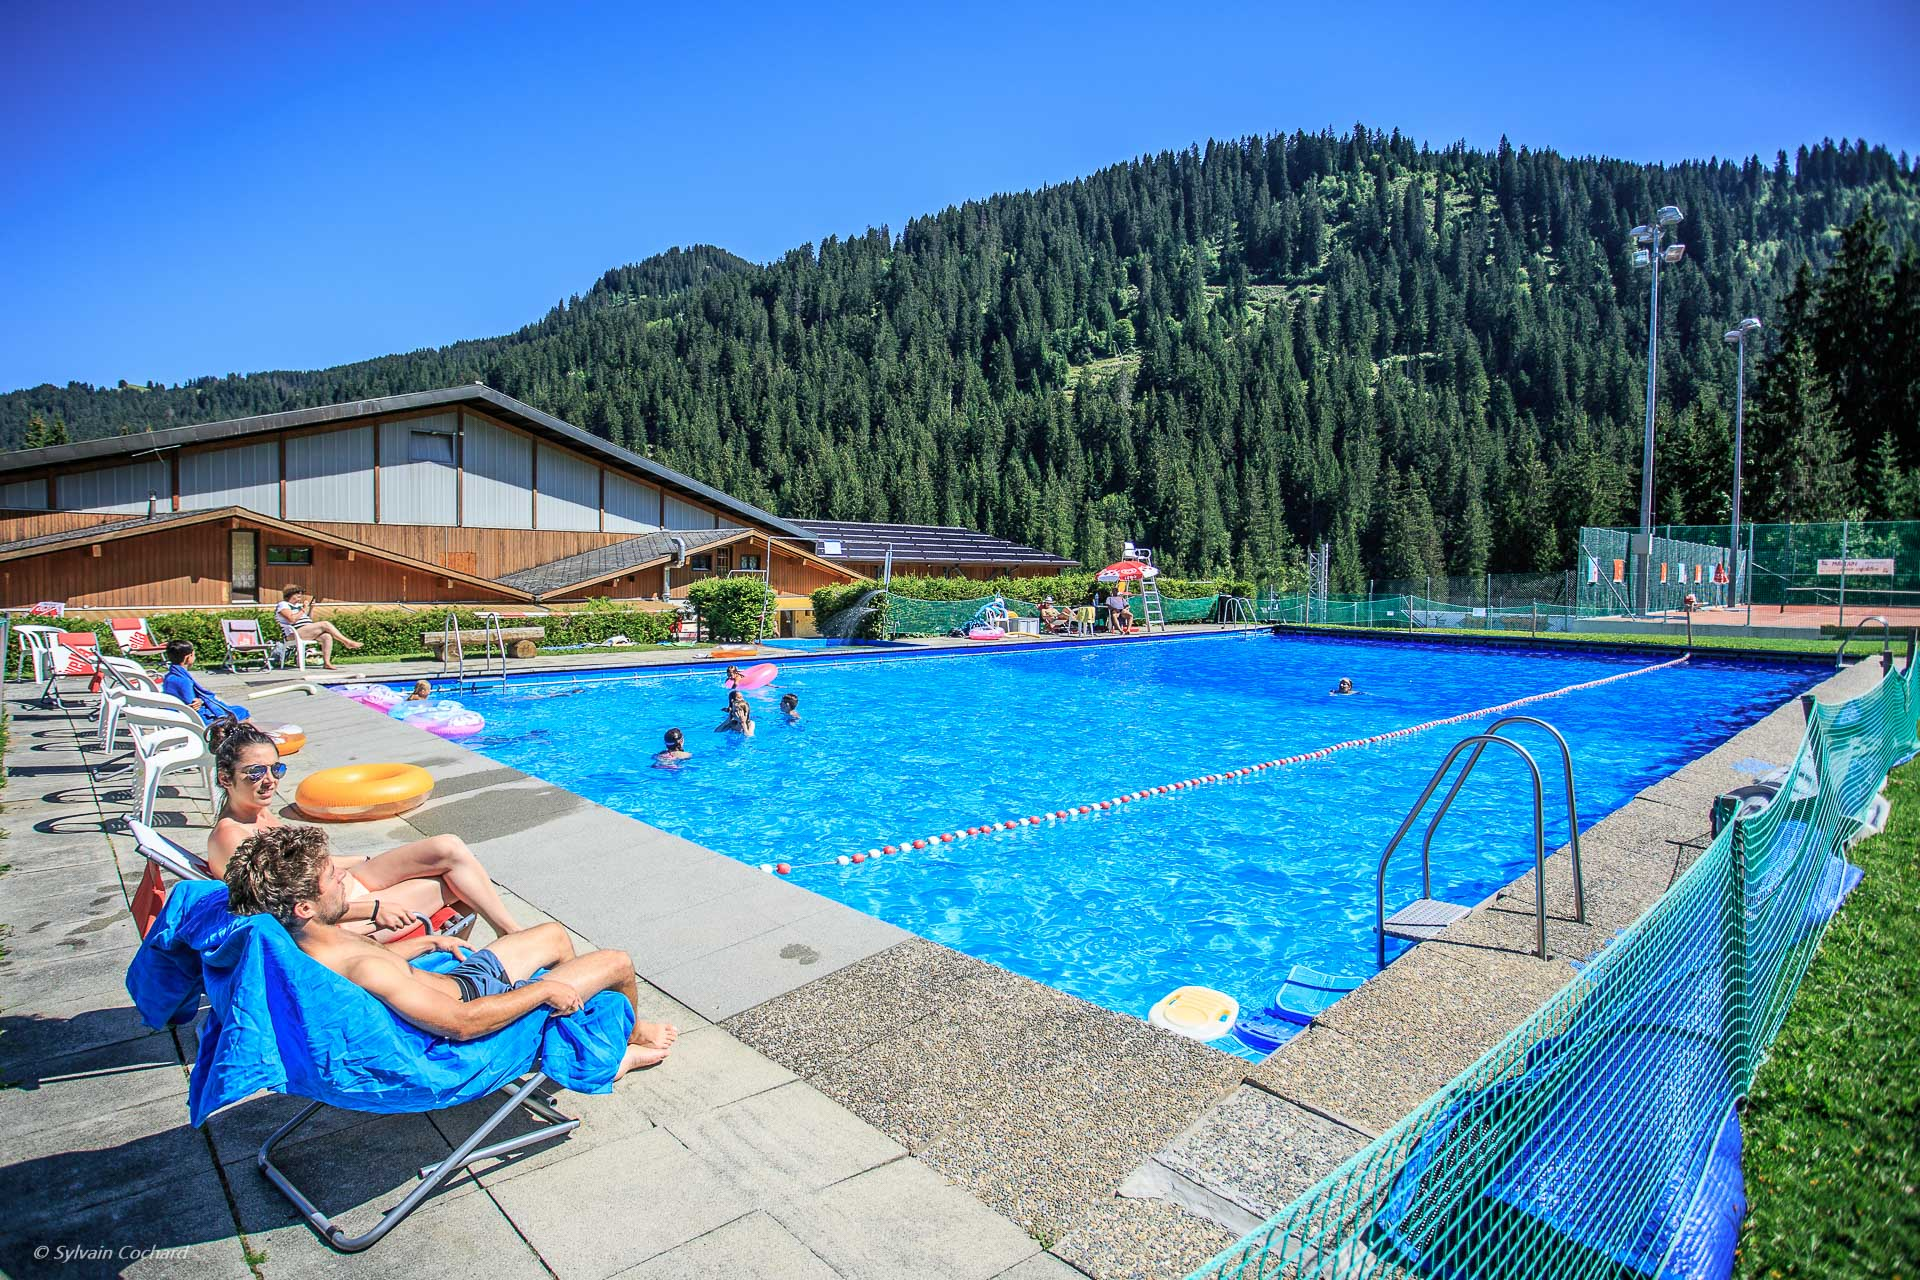 Piscine du centre sportif morgins morgins for Piscine en suisse